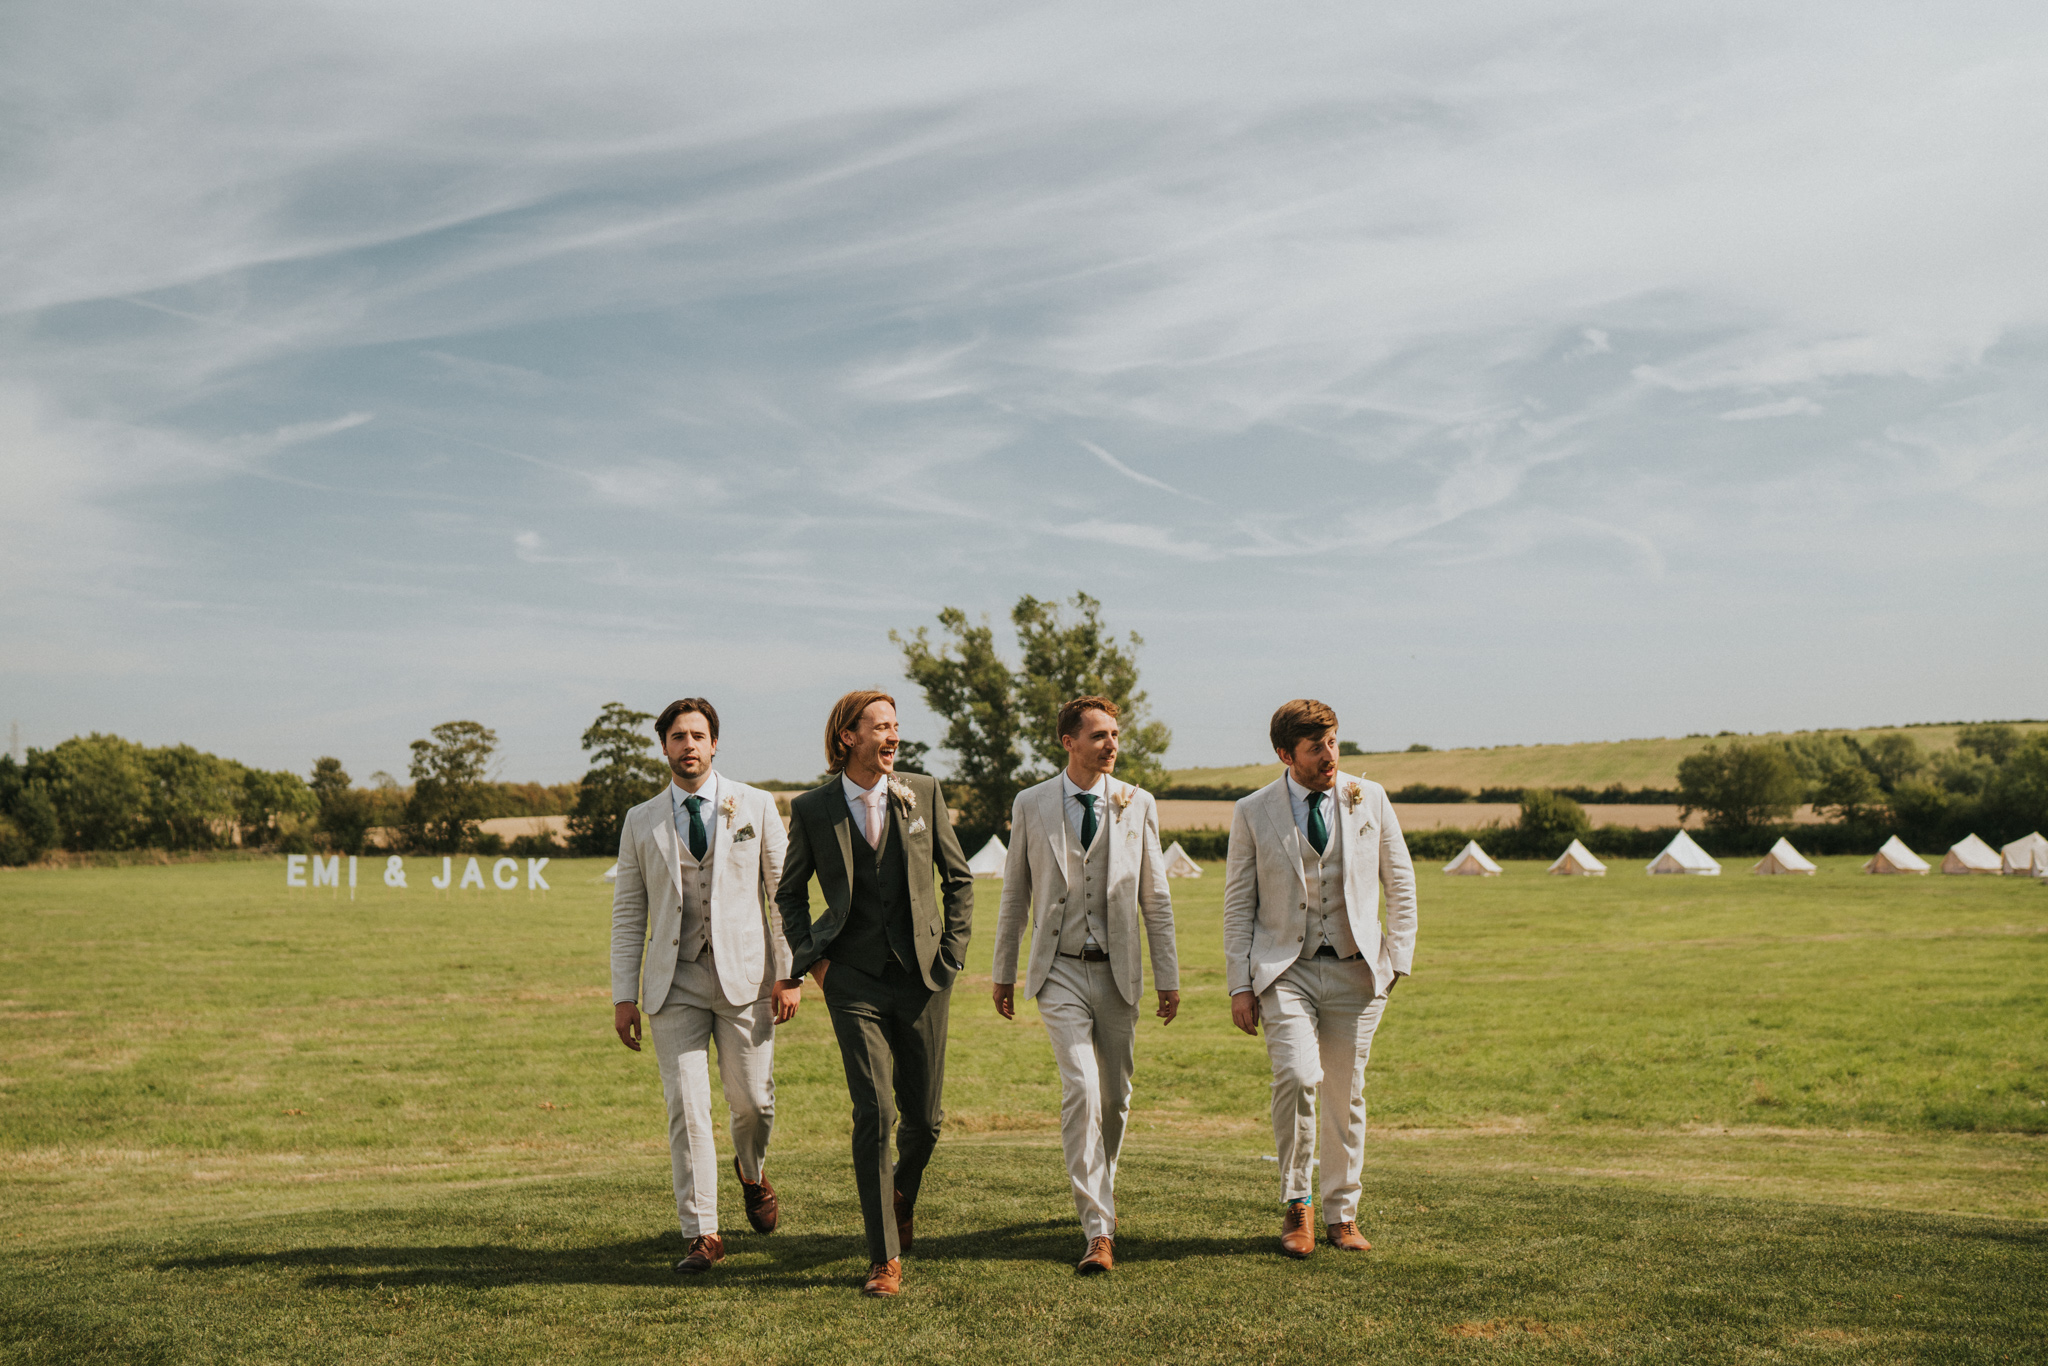 emi-Jack-boho-diy-wedding-eggington-house-grace-elizabeth-colchester-essex-alternative-wedding-photographer-suffolk-norfolk-devon (29 of 56).jpg